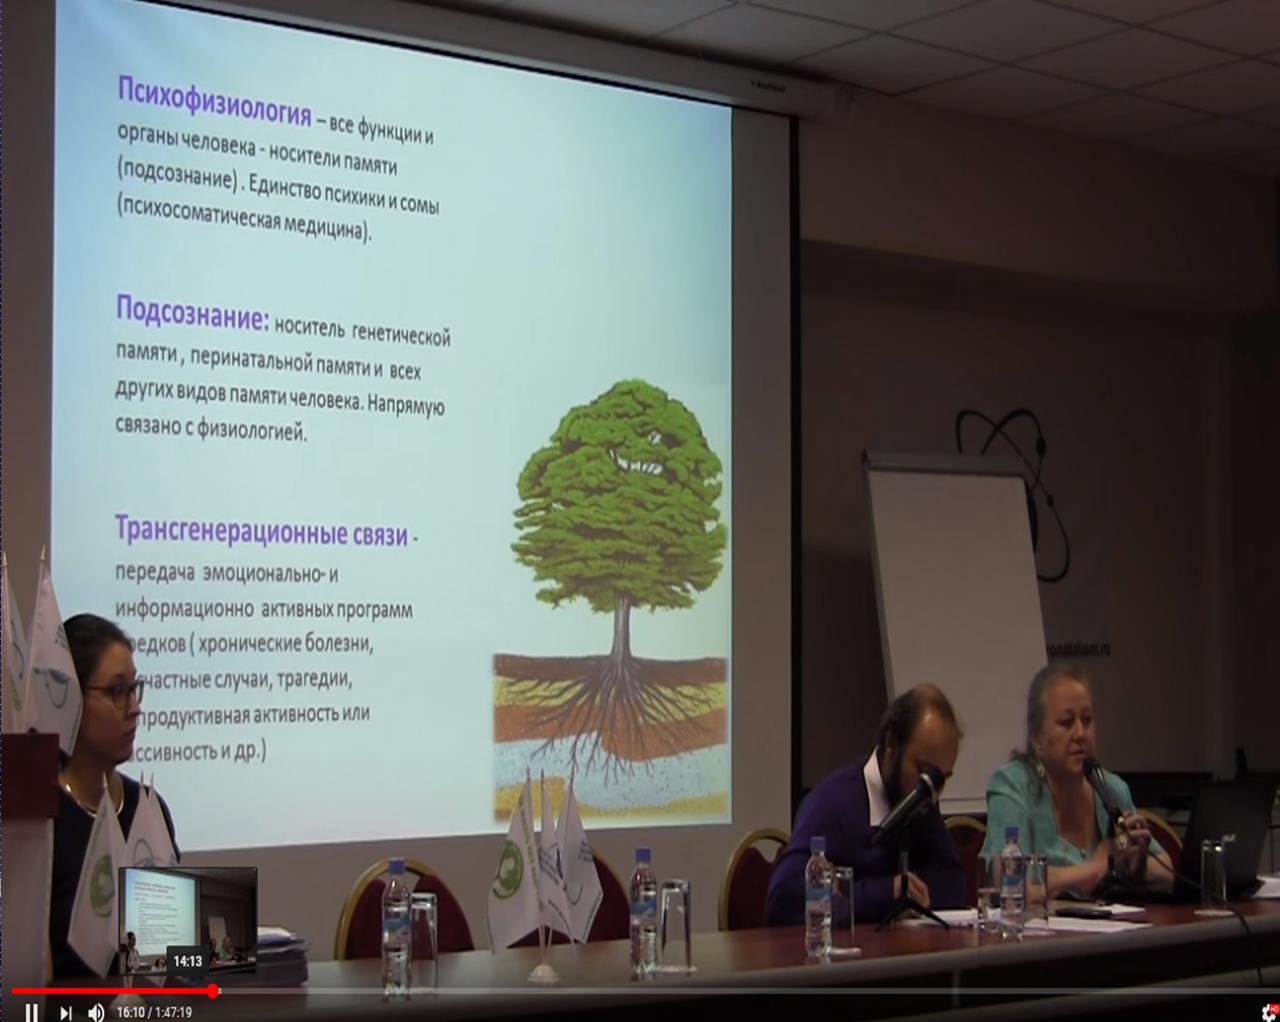 "Рис. 10. Доклад Н. П. Коваленко на фестивале ""За жизнь"" (Москва, 2015 г.)."